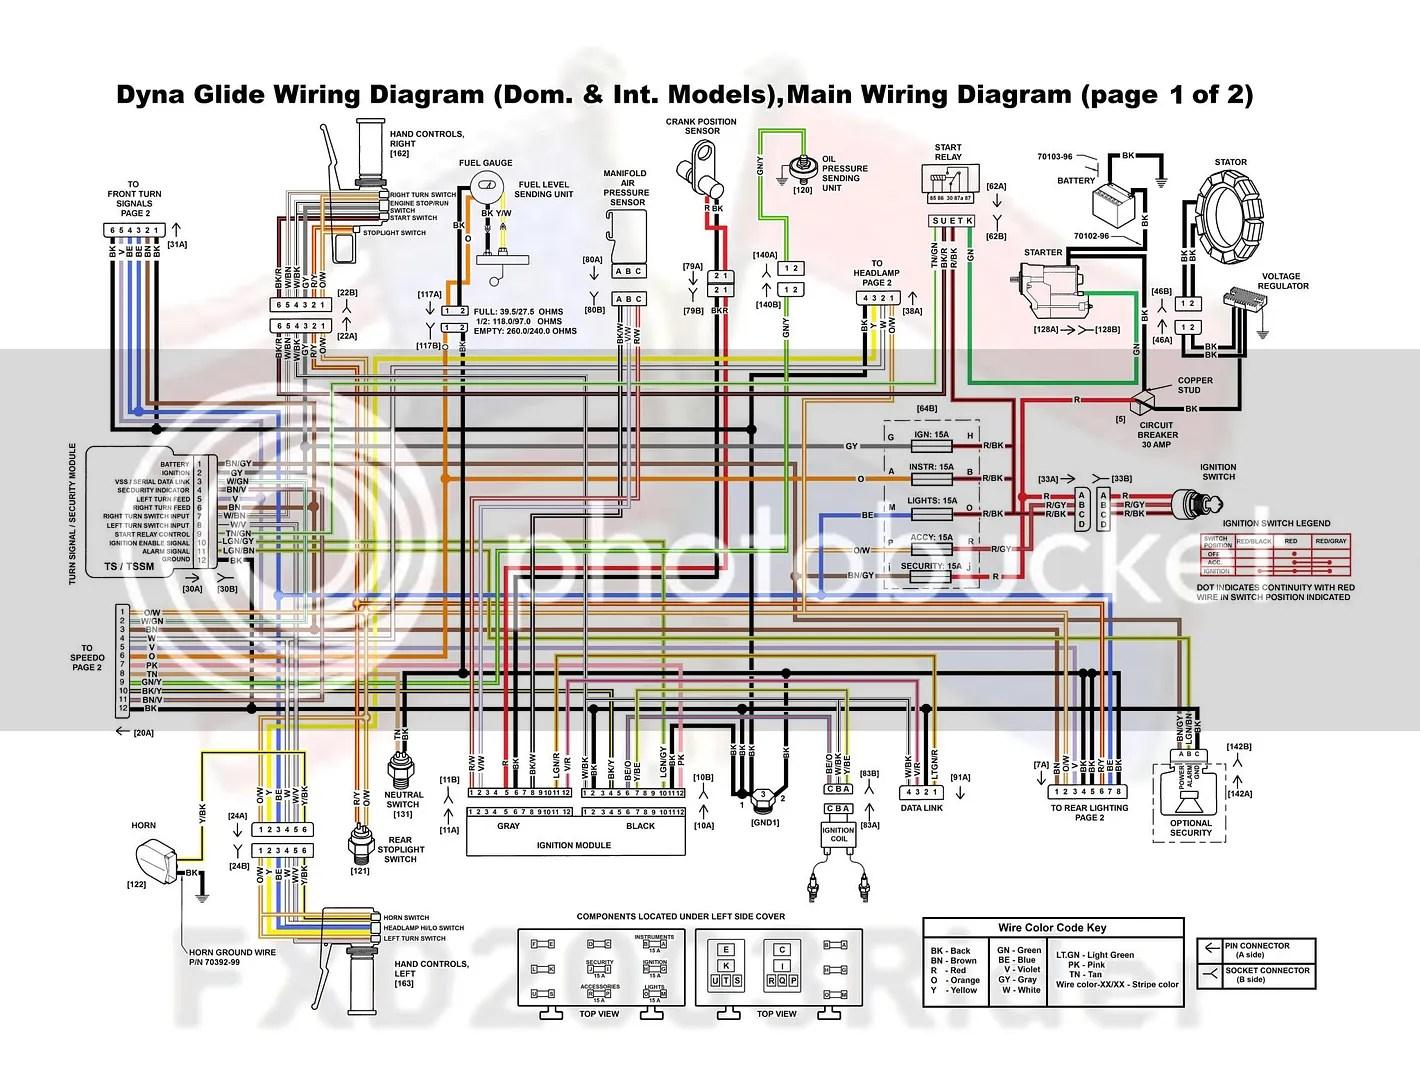 97 Harley Wiring Diagram | Wiring Diagram on